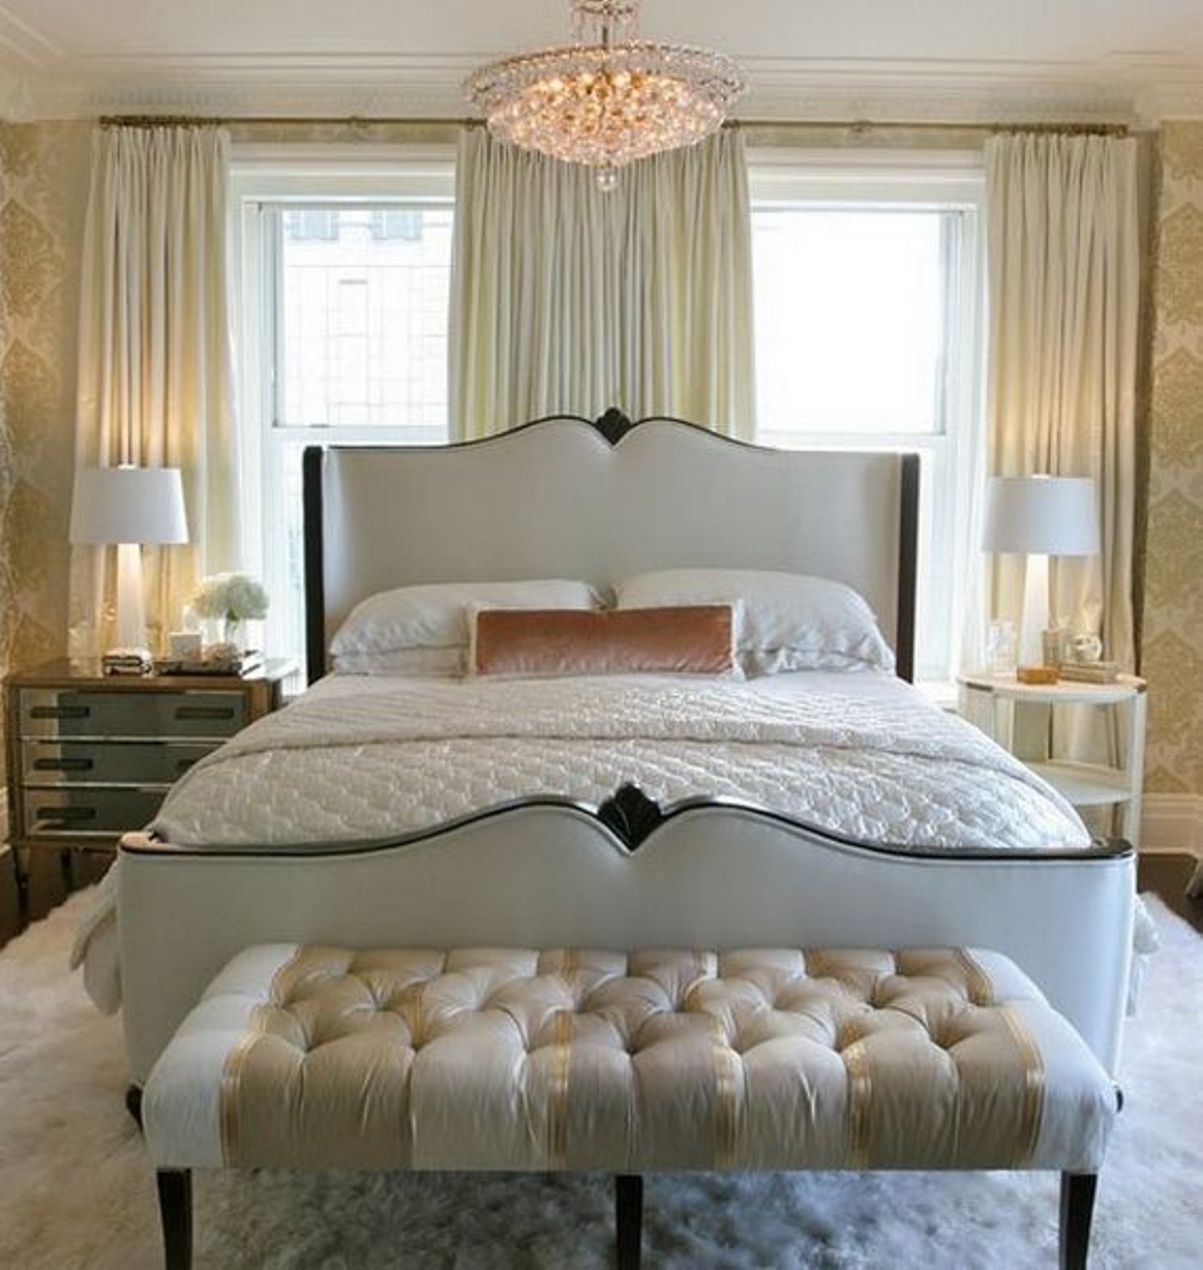 Latest Bedroom Colors 2015 Elegant Master Bedroom Decor Mirror On Bedroom Ceiling Blue Bedroom For Boys: Elegant Bedroom Decorating Ideas